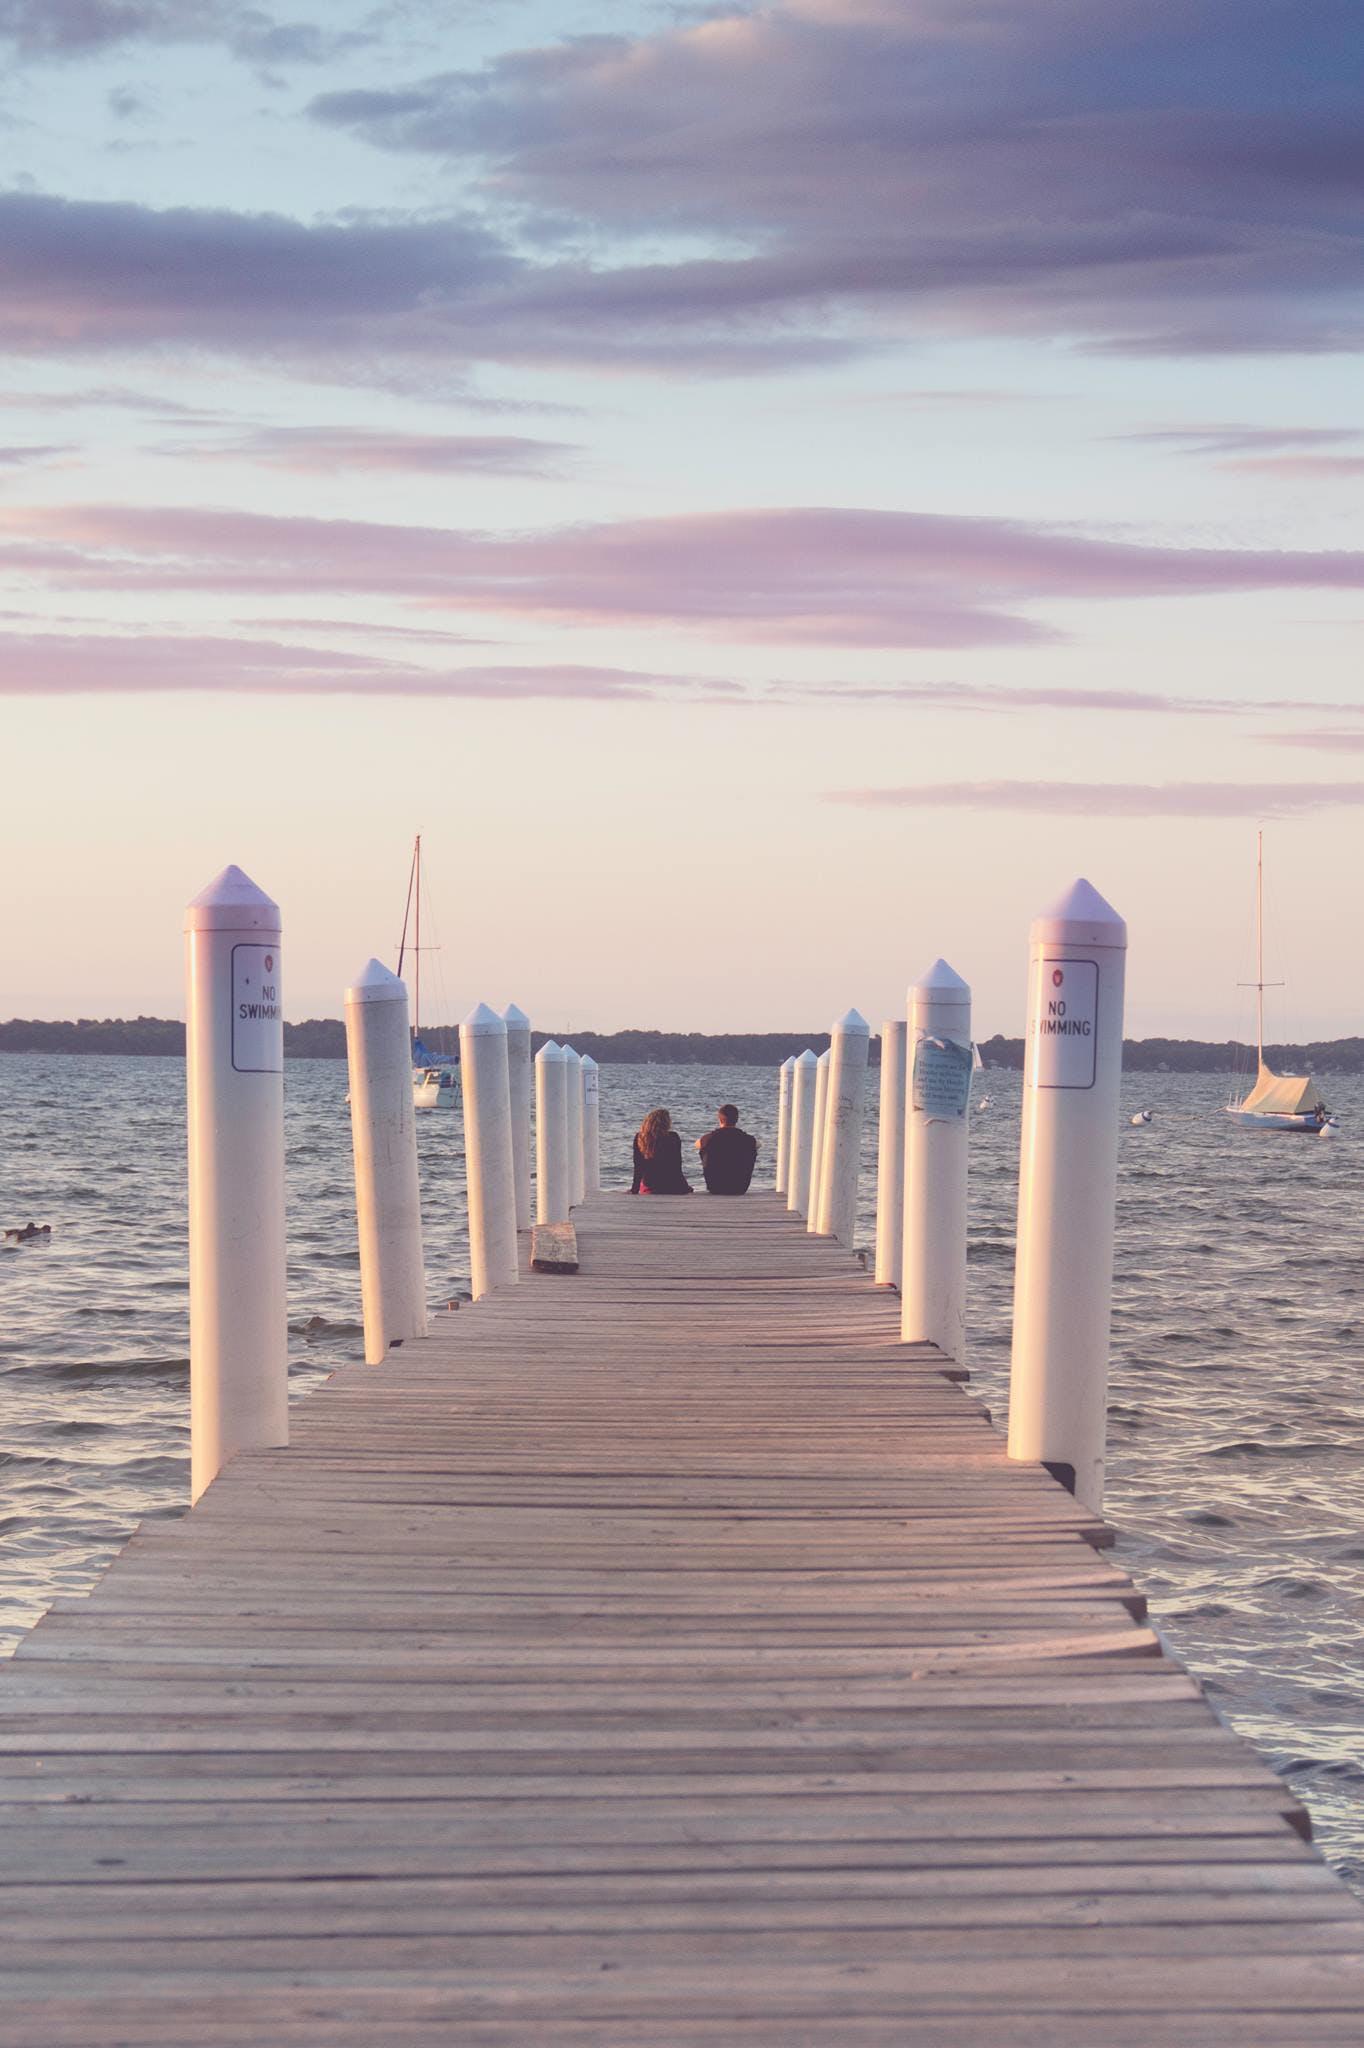 Free stock photo of couple, lake, pier, sailboats